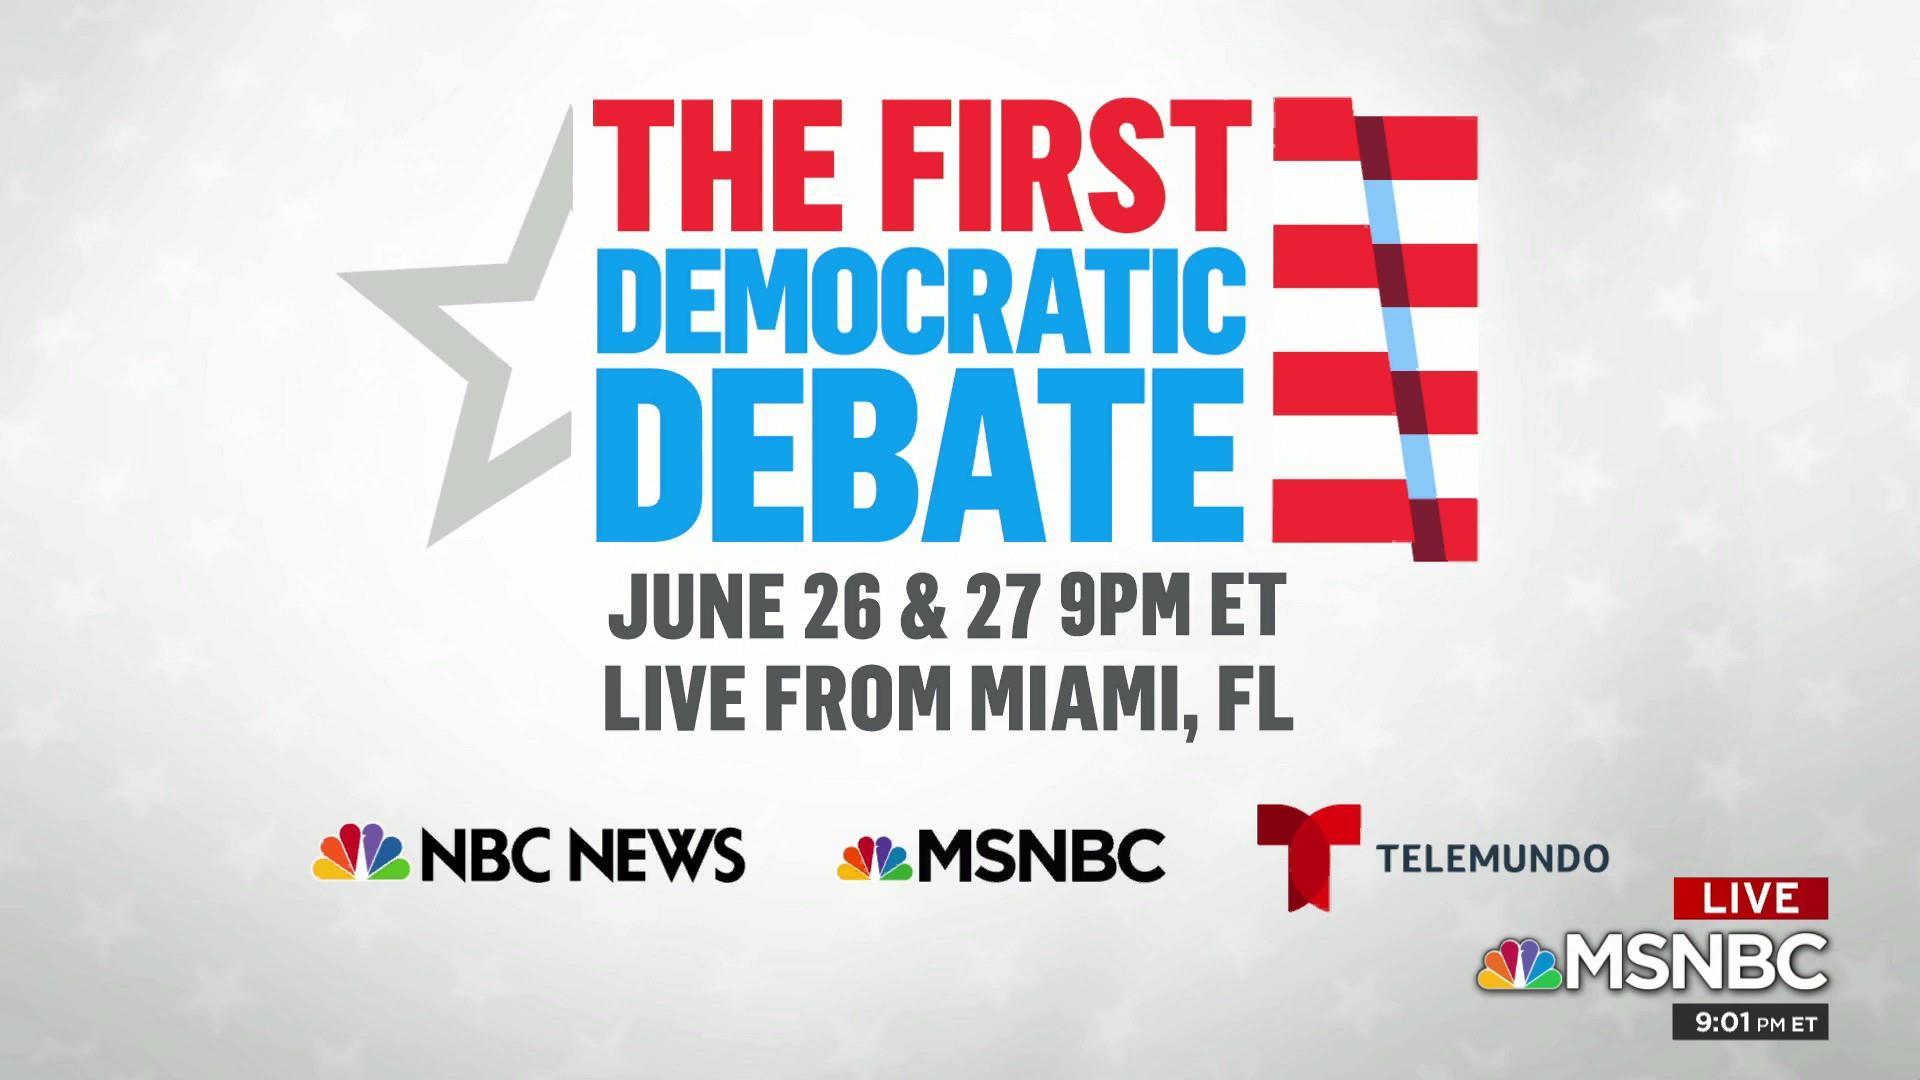 DNC announces first debate details as candidates vie for spots